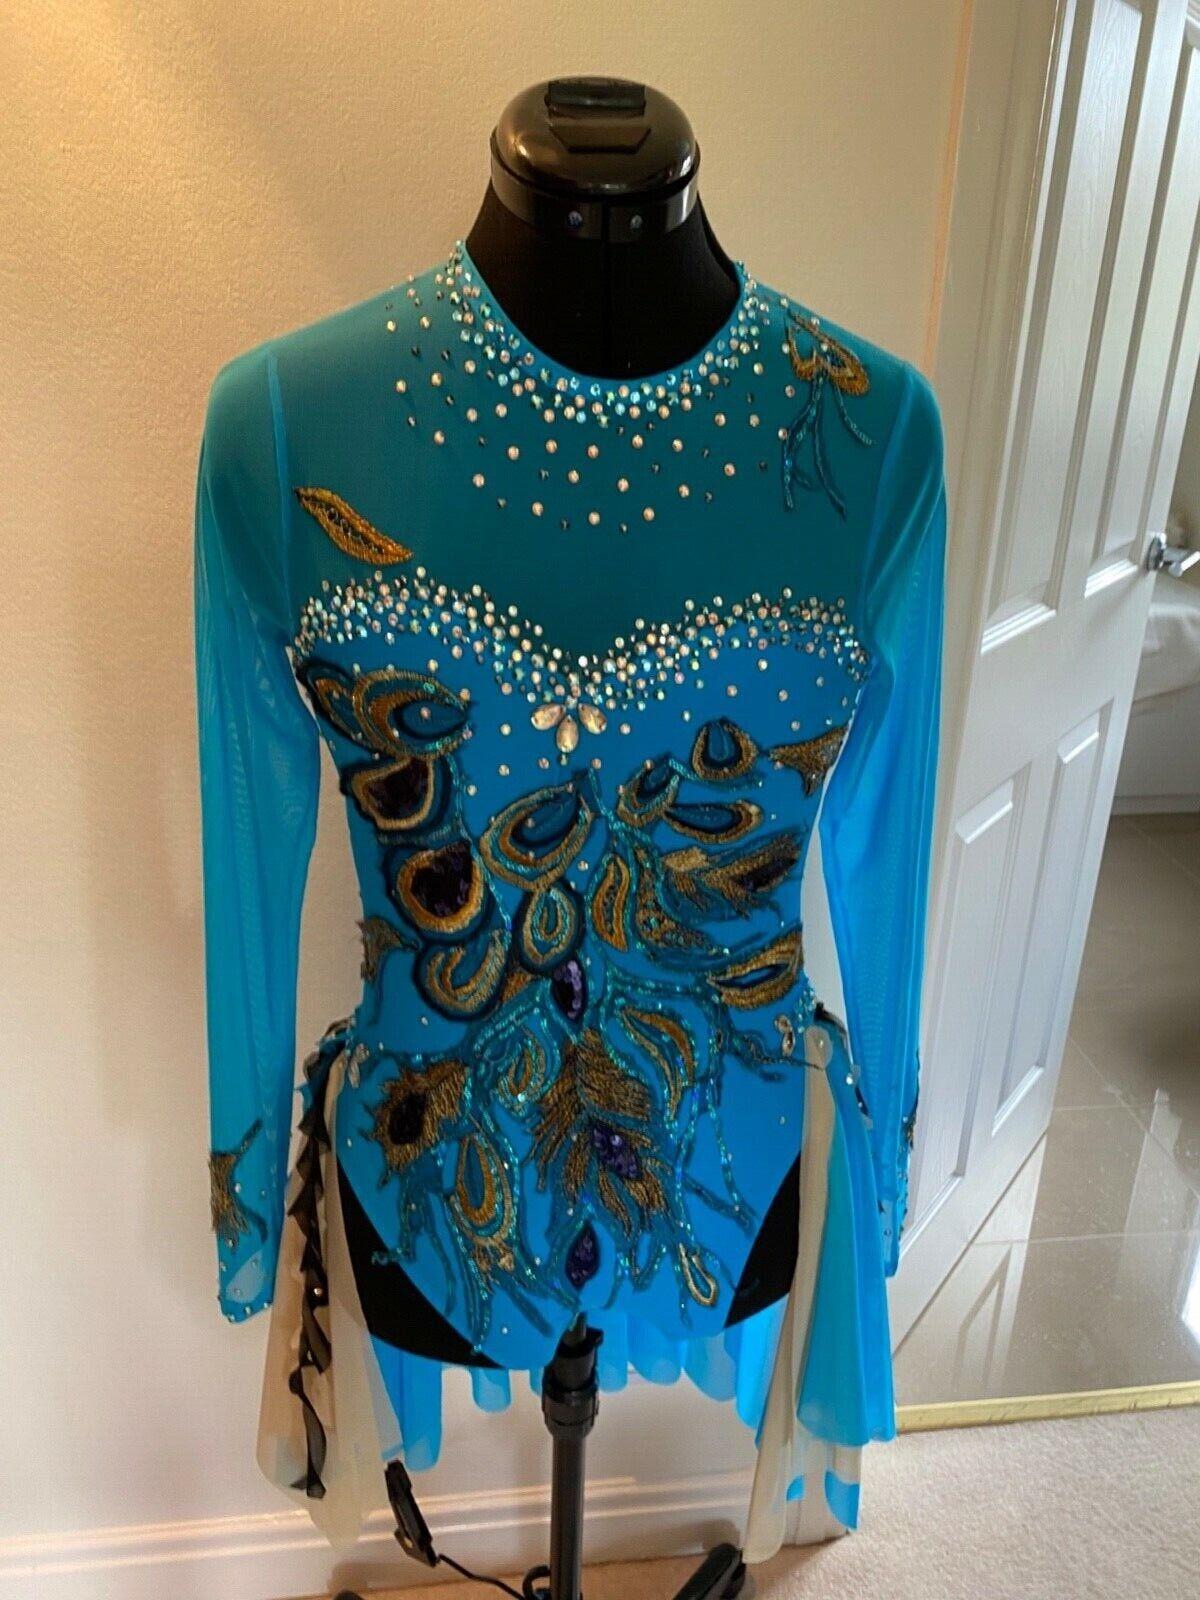 Bright blue peacock embellished dance / lyrical / modern / costume 13-15 years